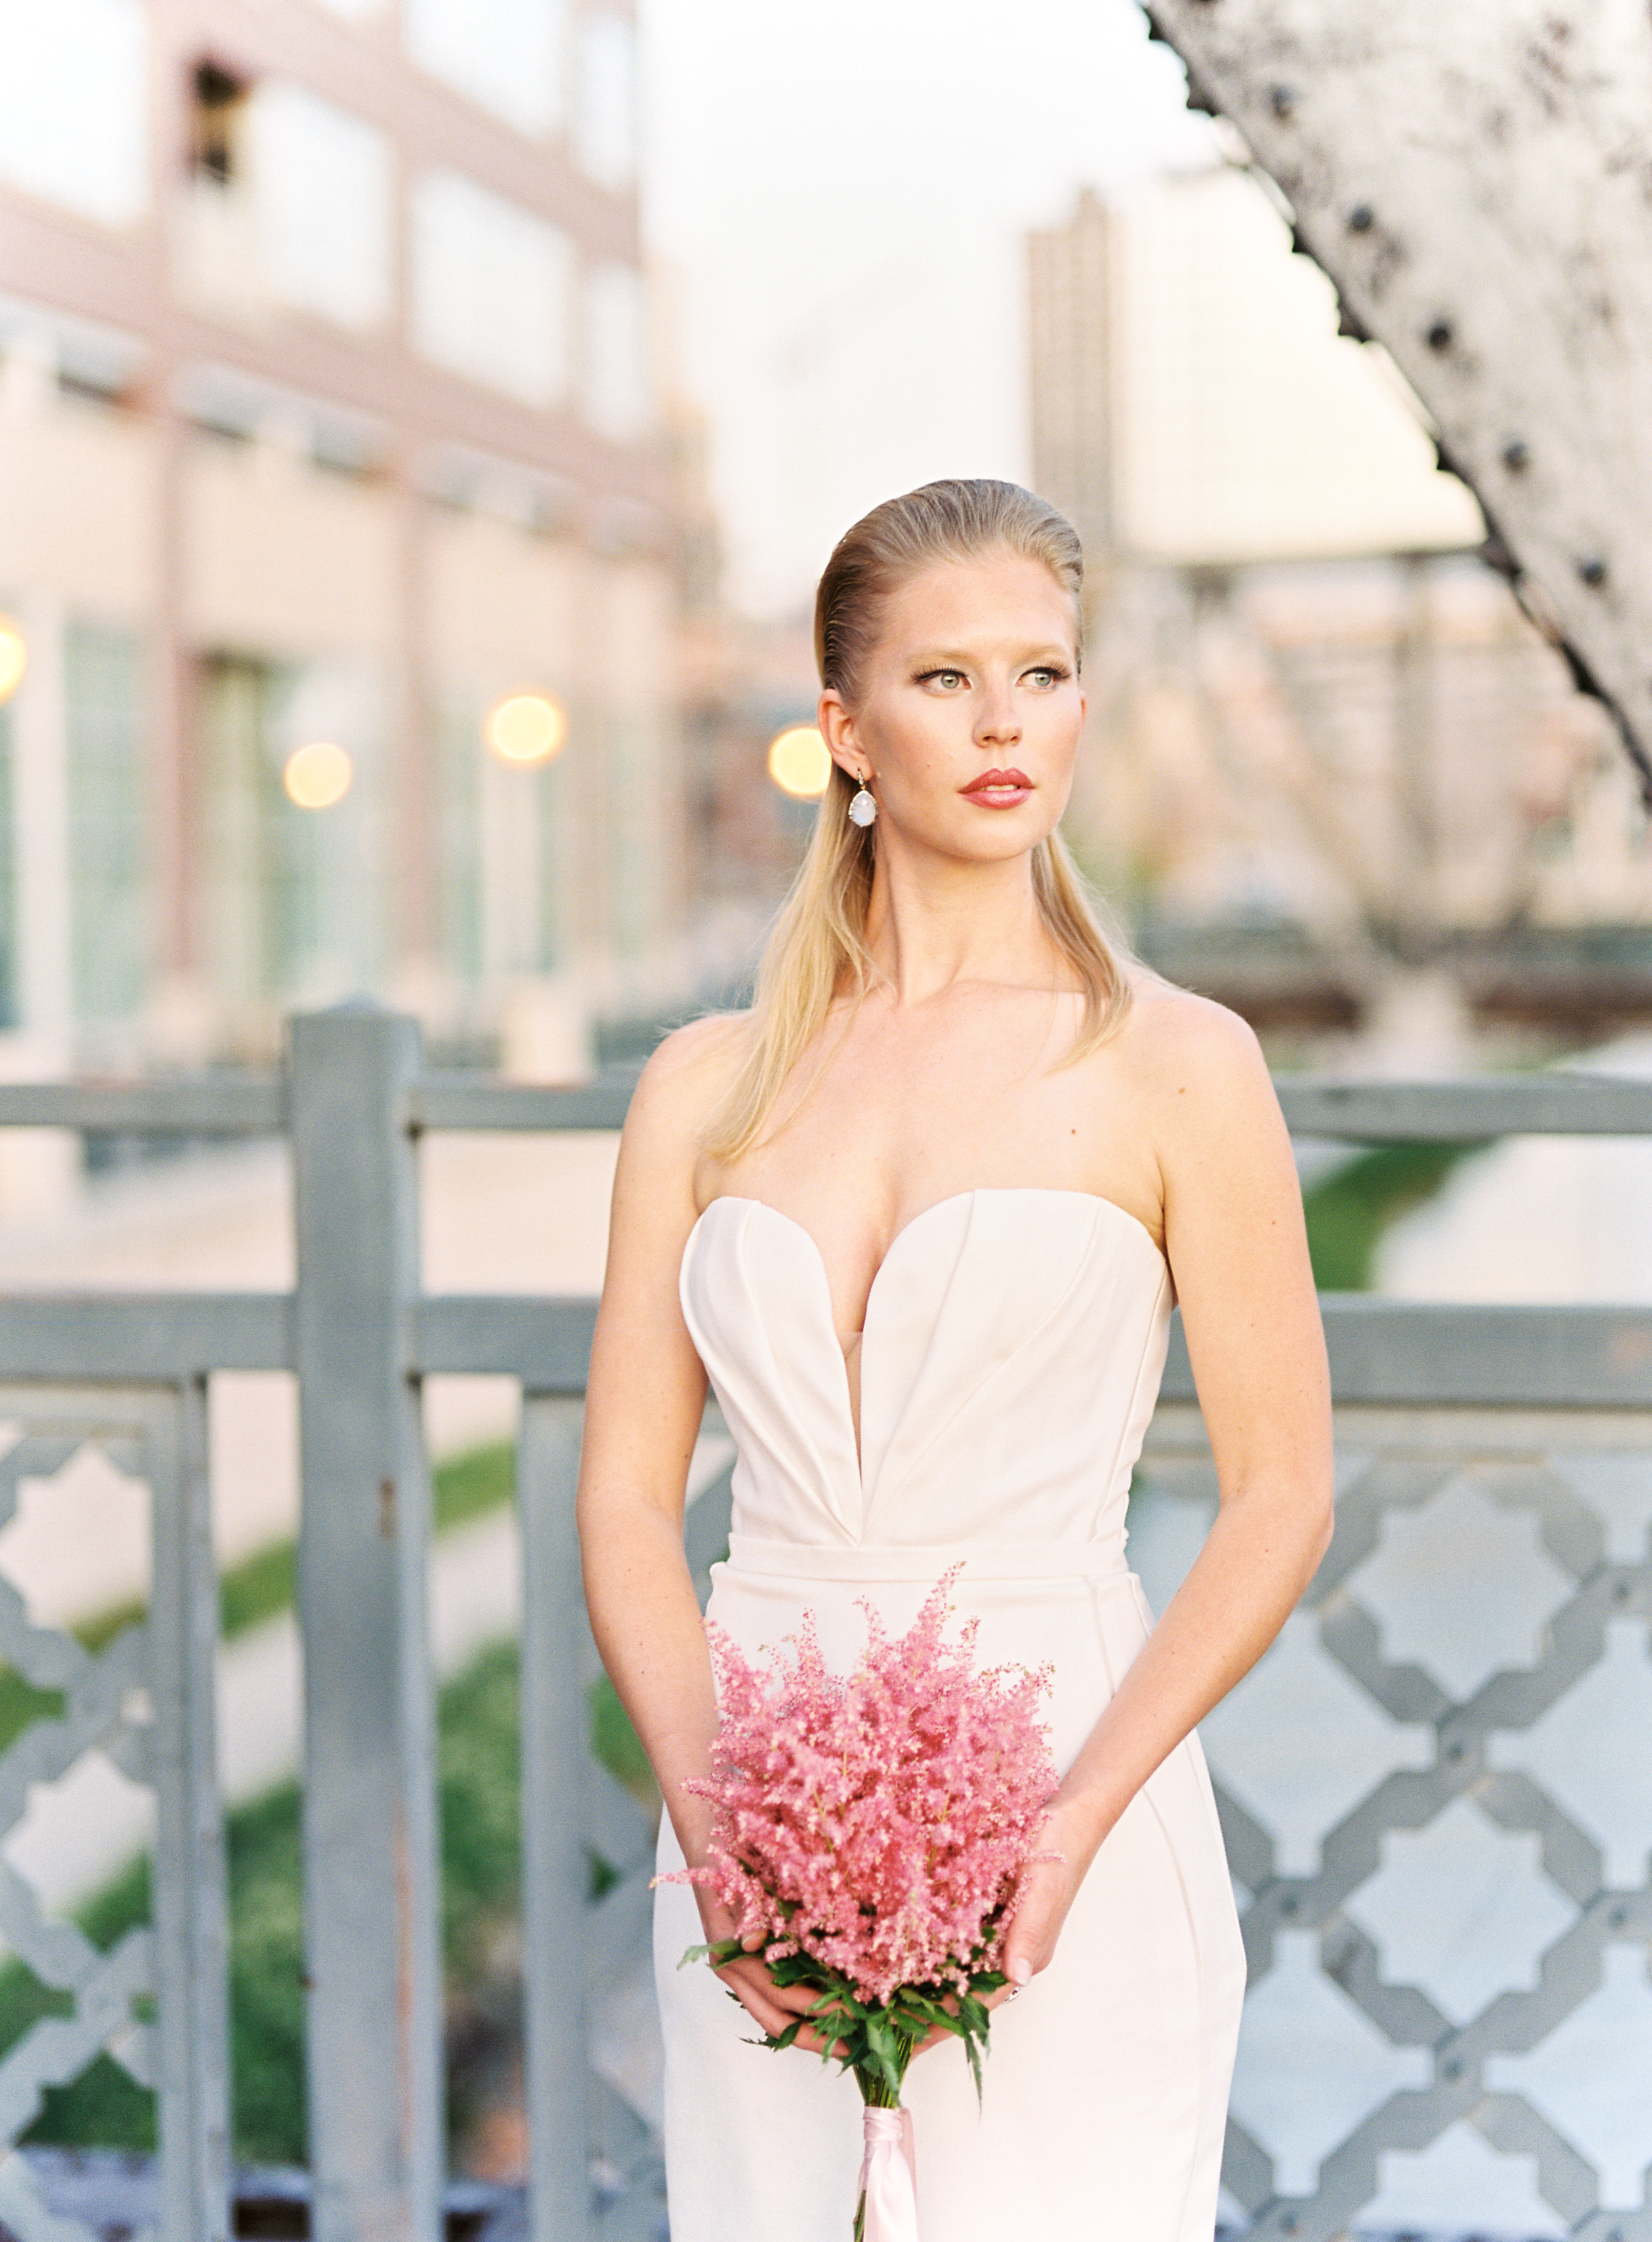 11-Laura-Murray-Photography-Annaleigh-and-Joe-wedding3.jpg